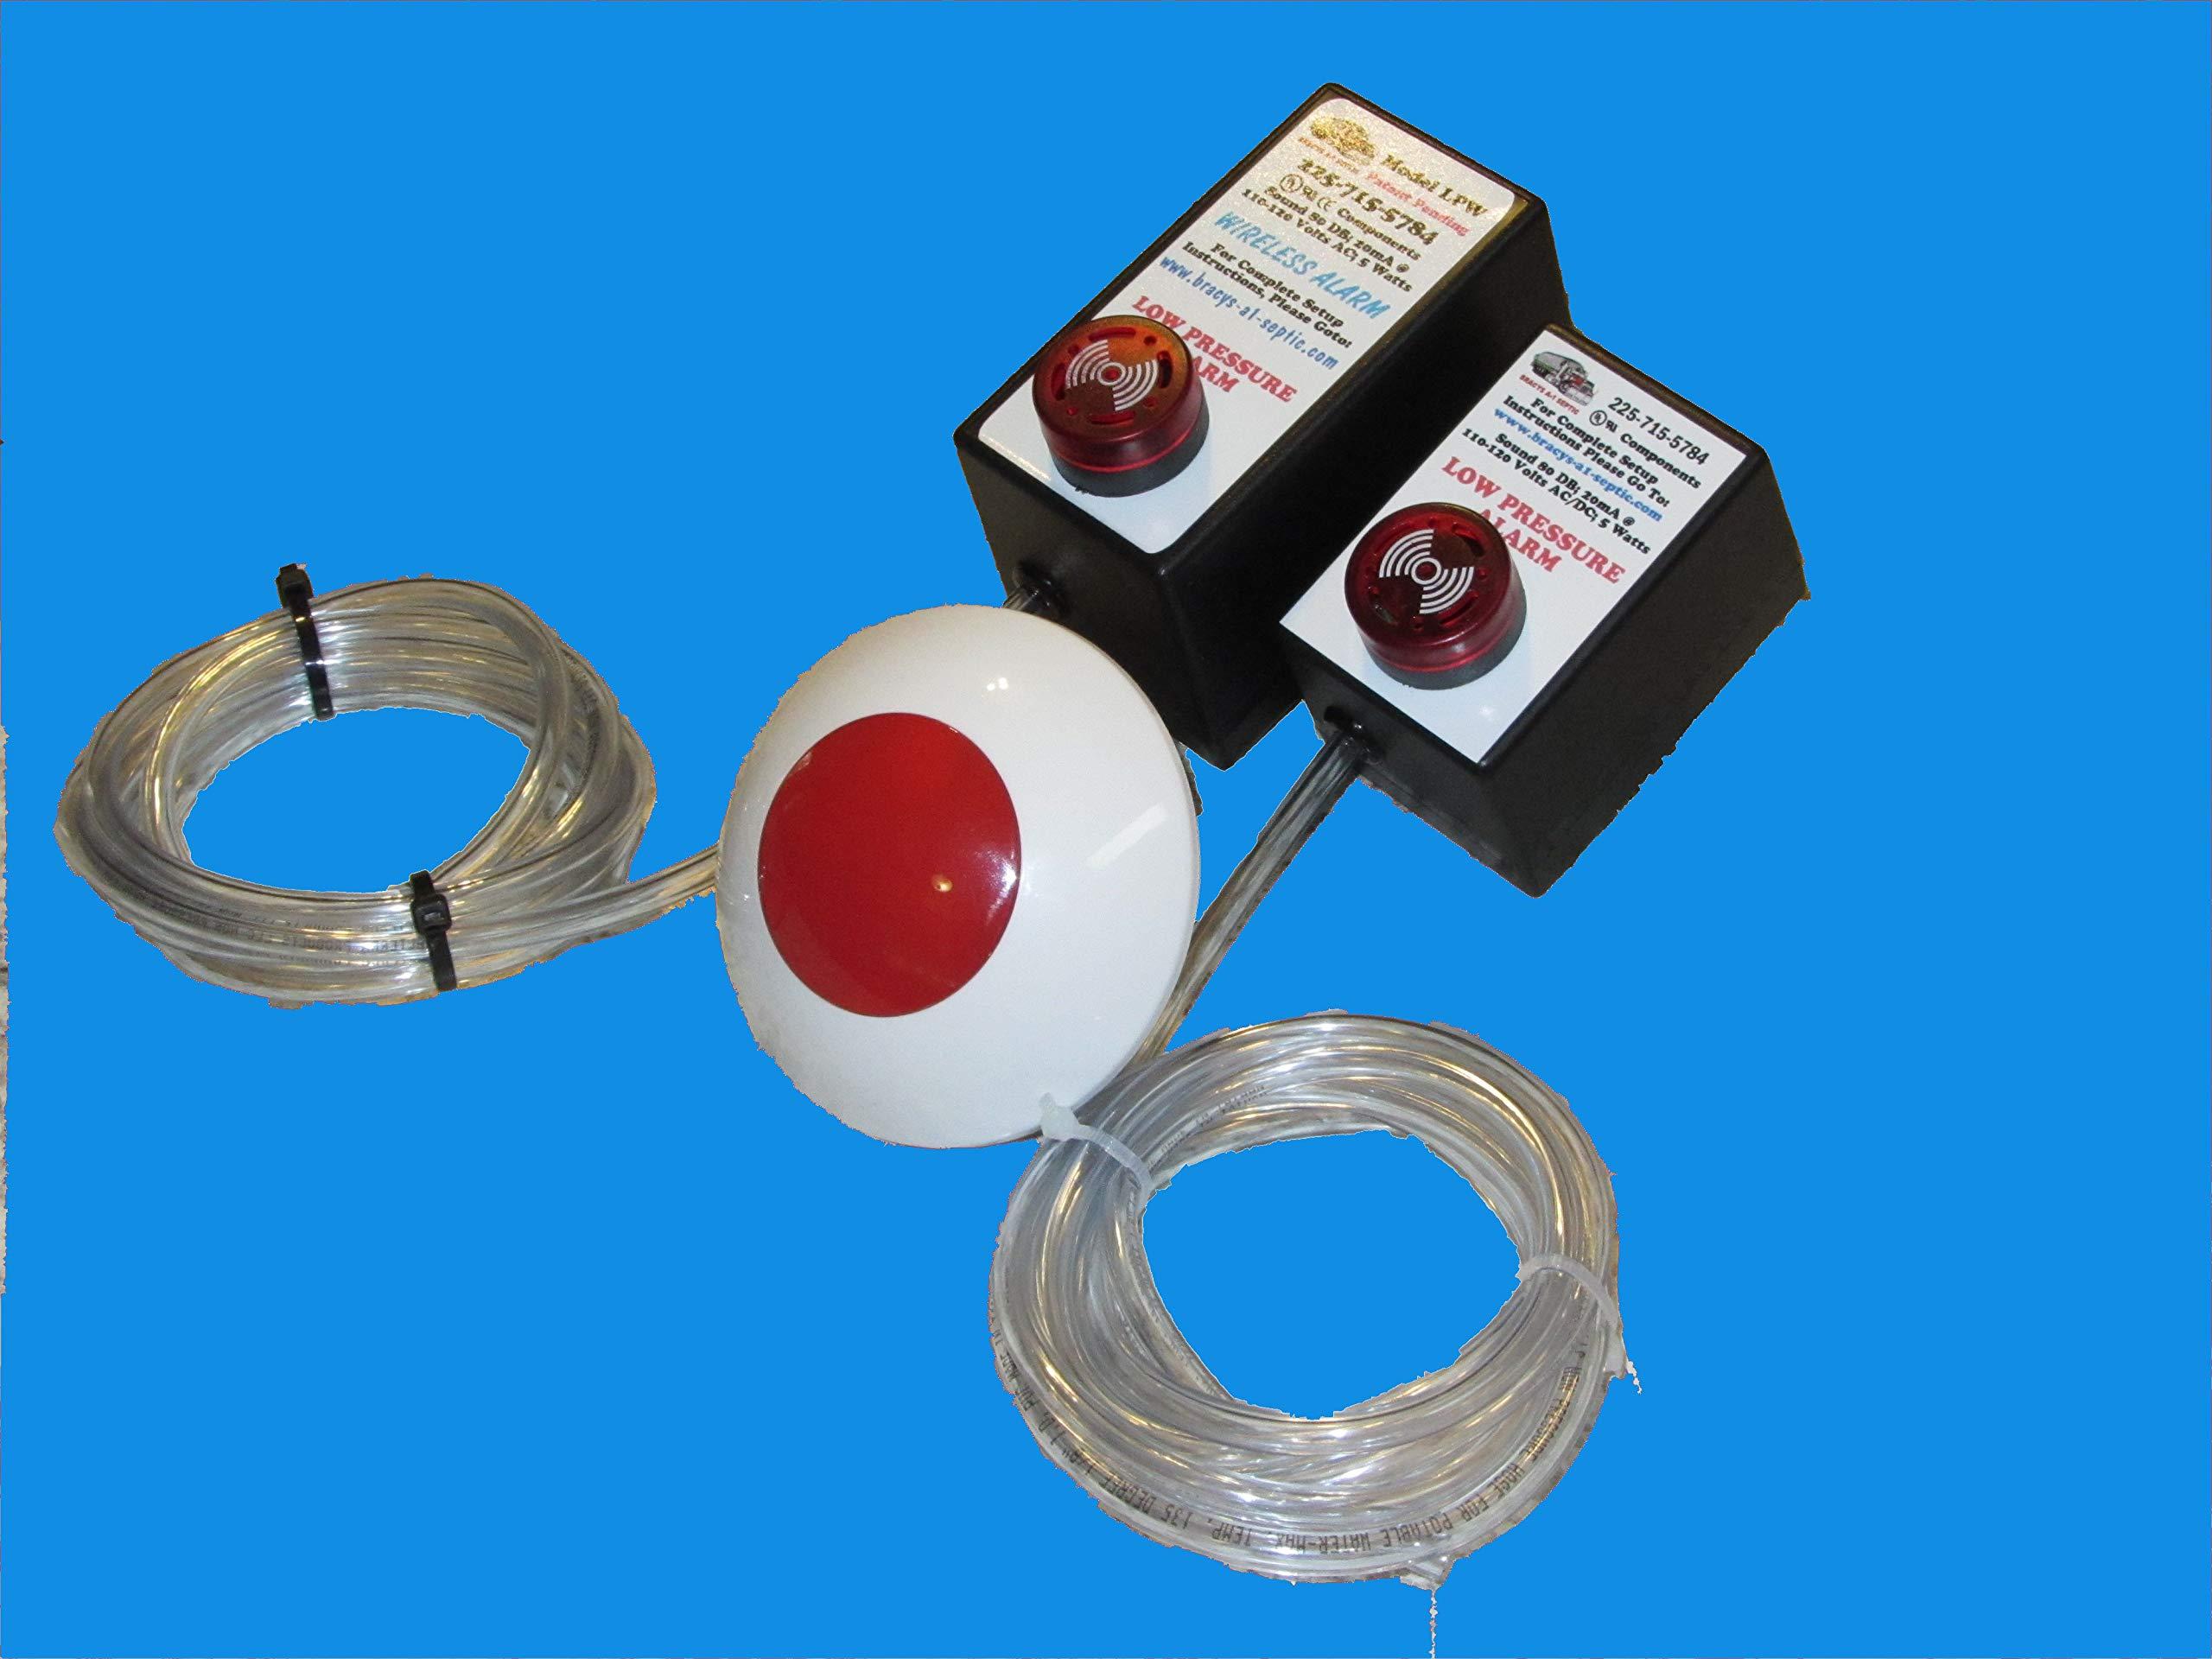 Low Air Pressure Plugin Alarm for Septic Linear Diaphragm Air Pumps (Standard) by Bracys A-1 Septic